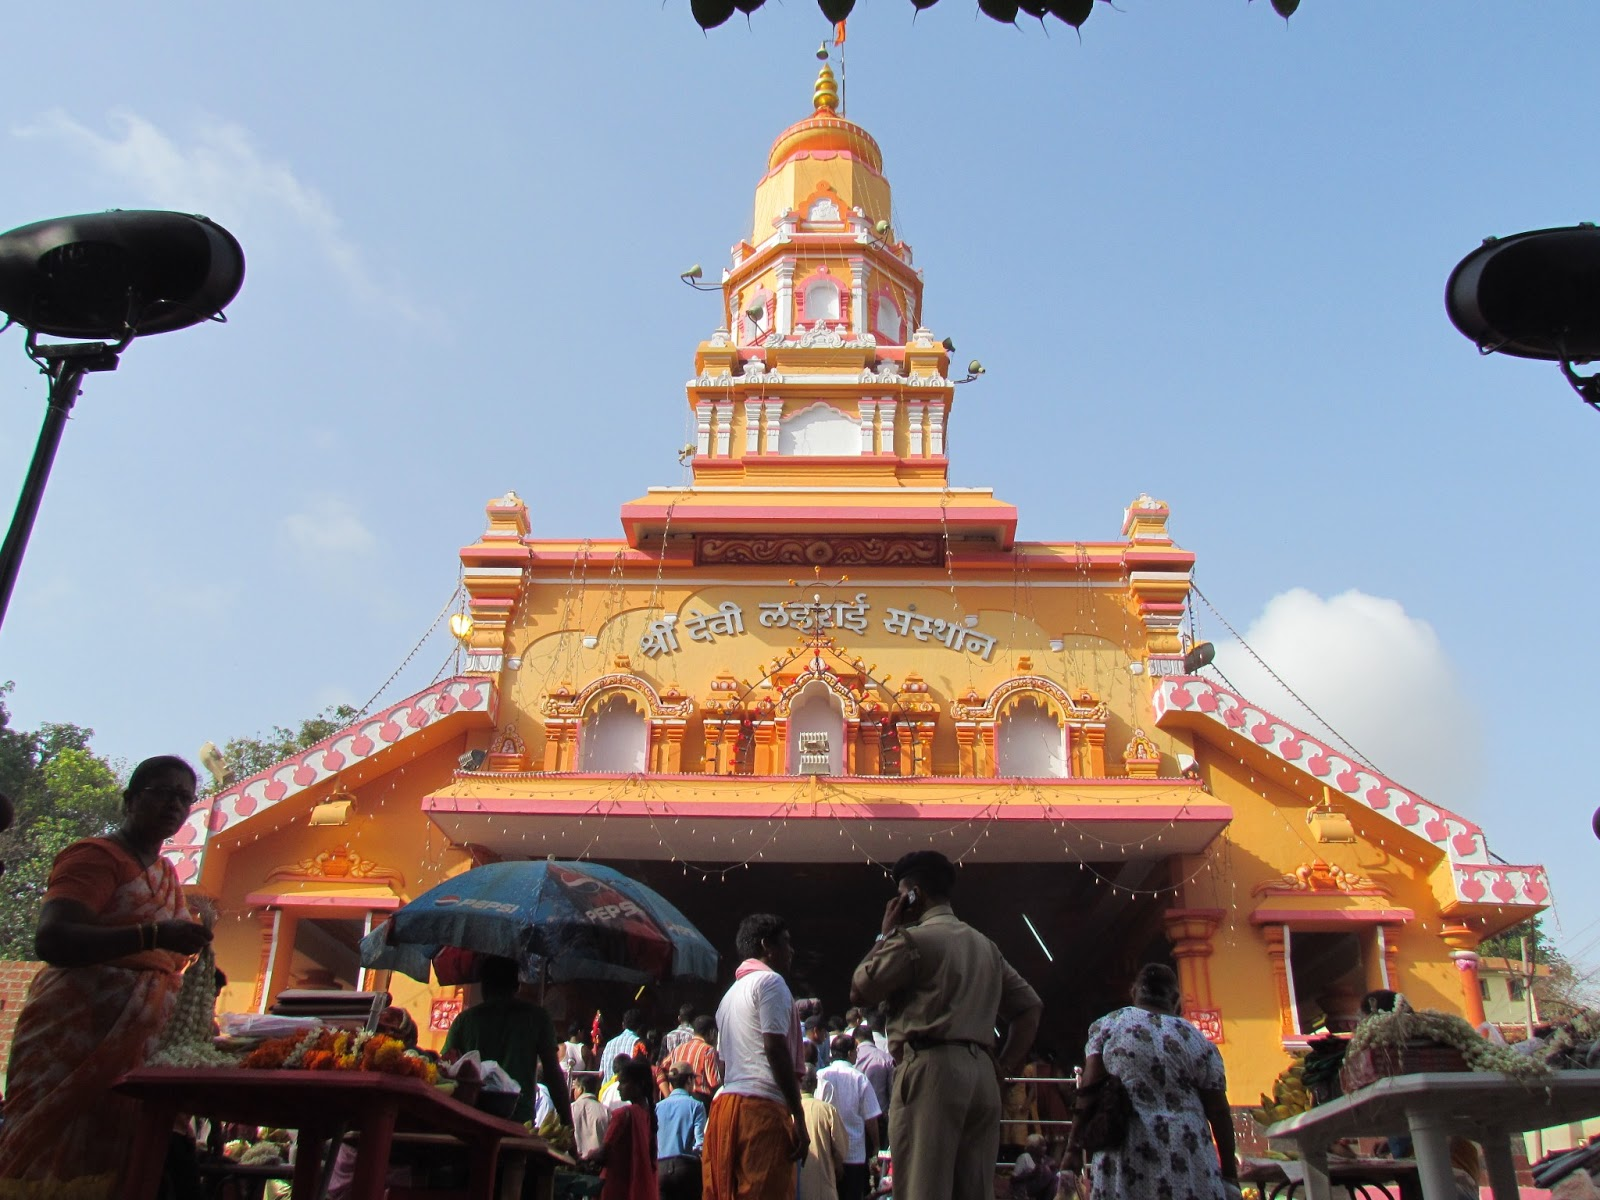 Shree Lairai Devi Devasthan - Goa Image